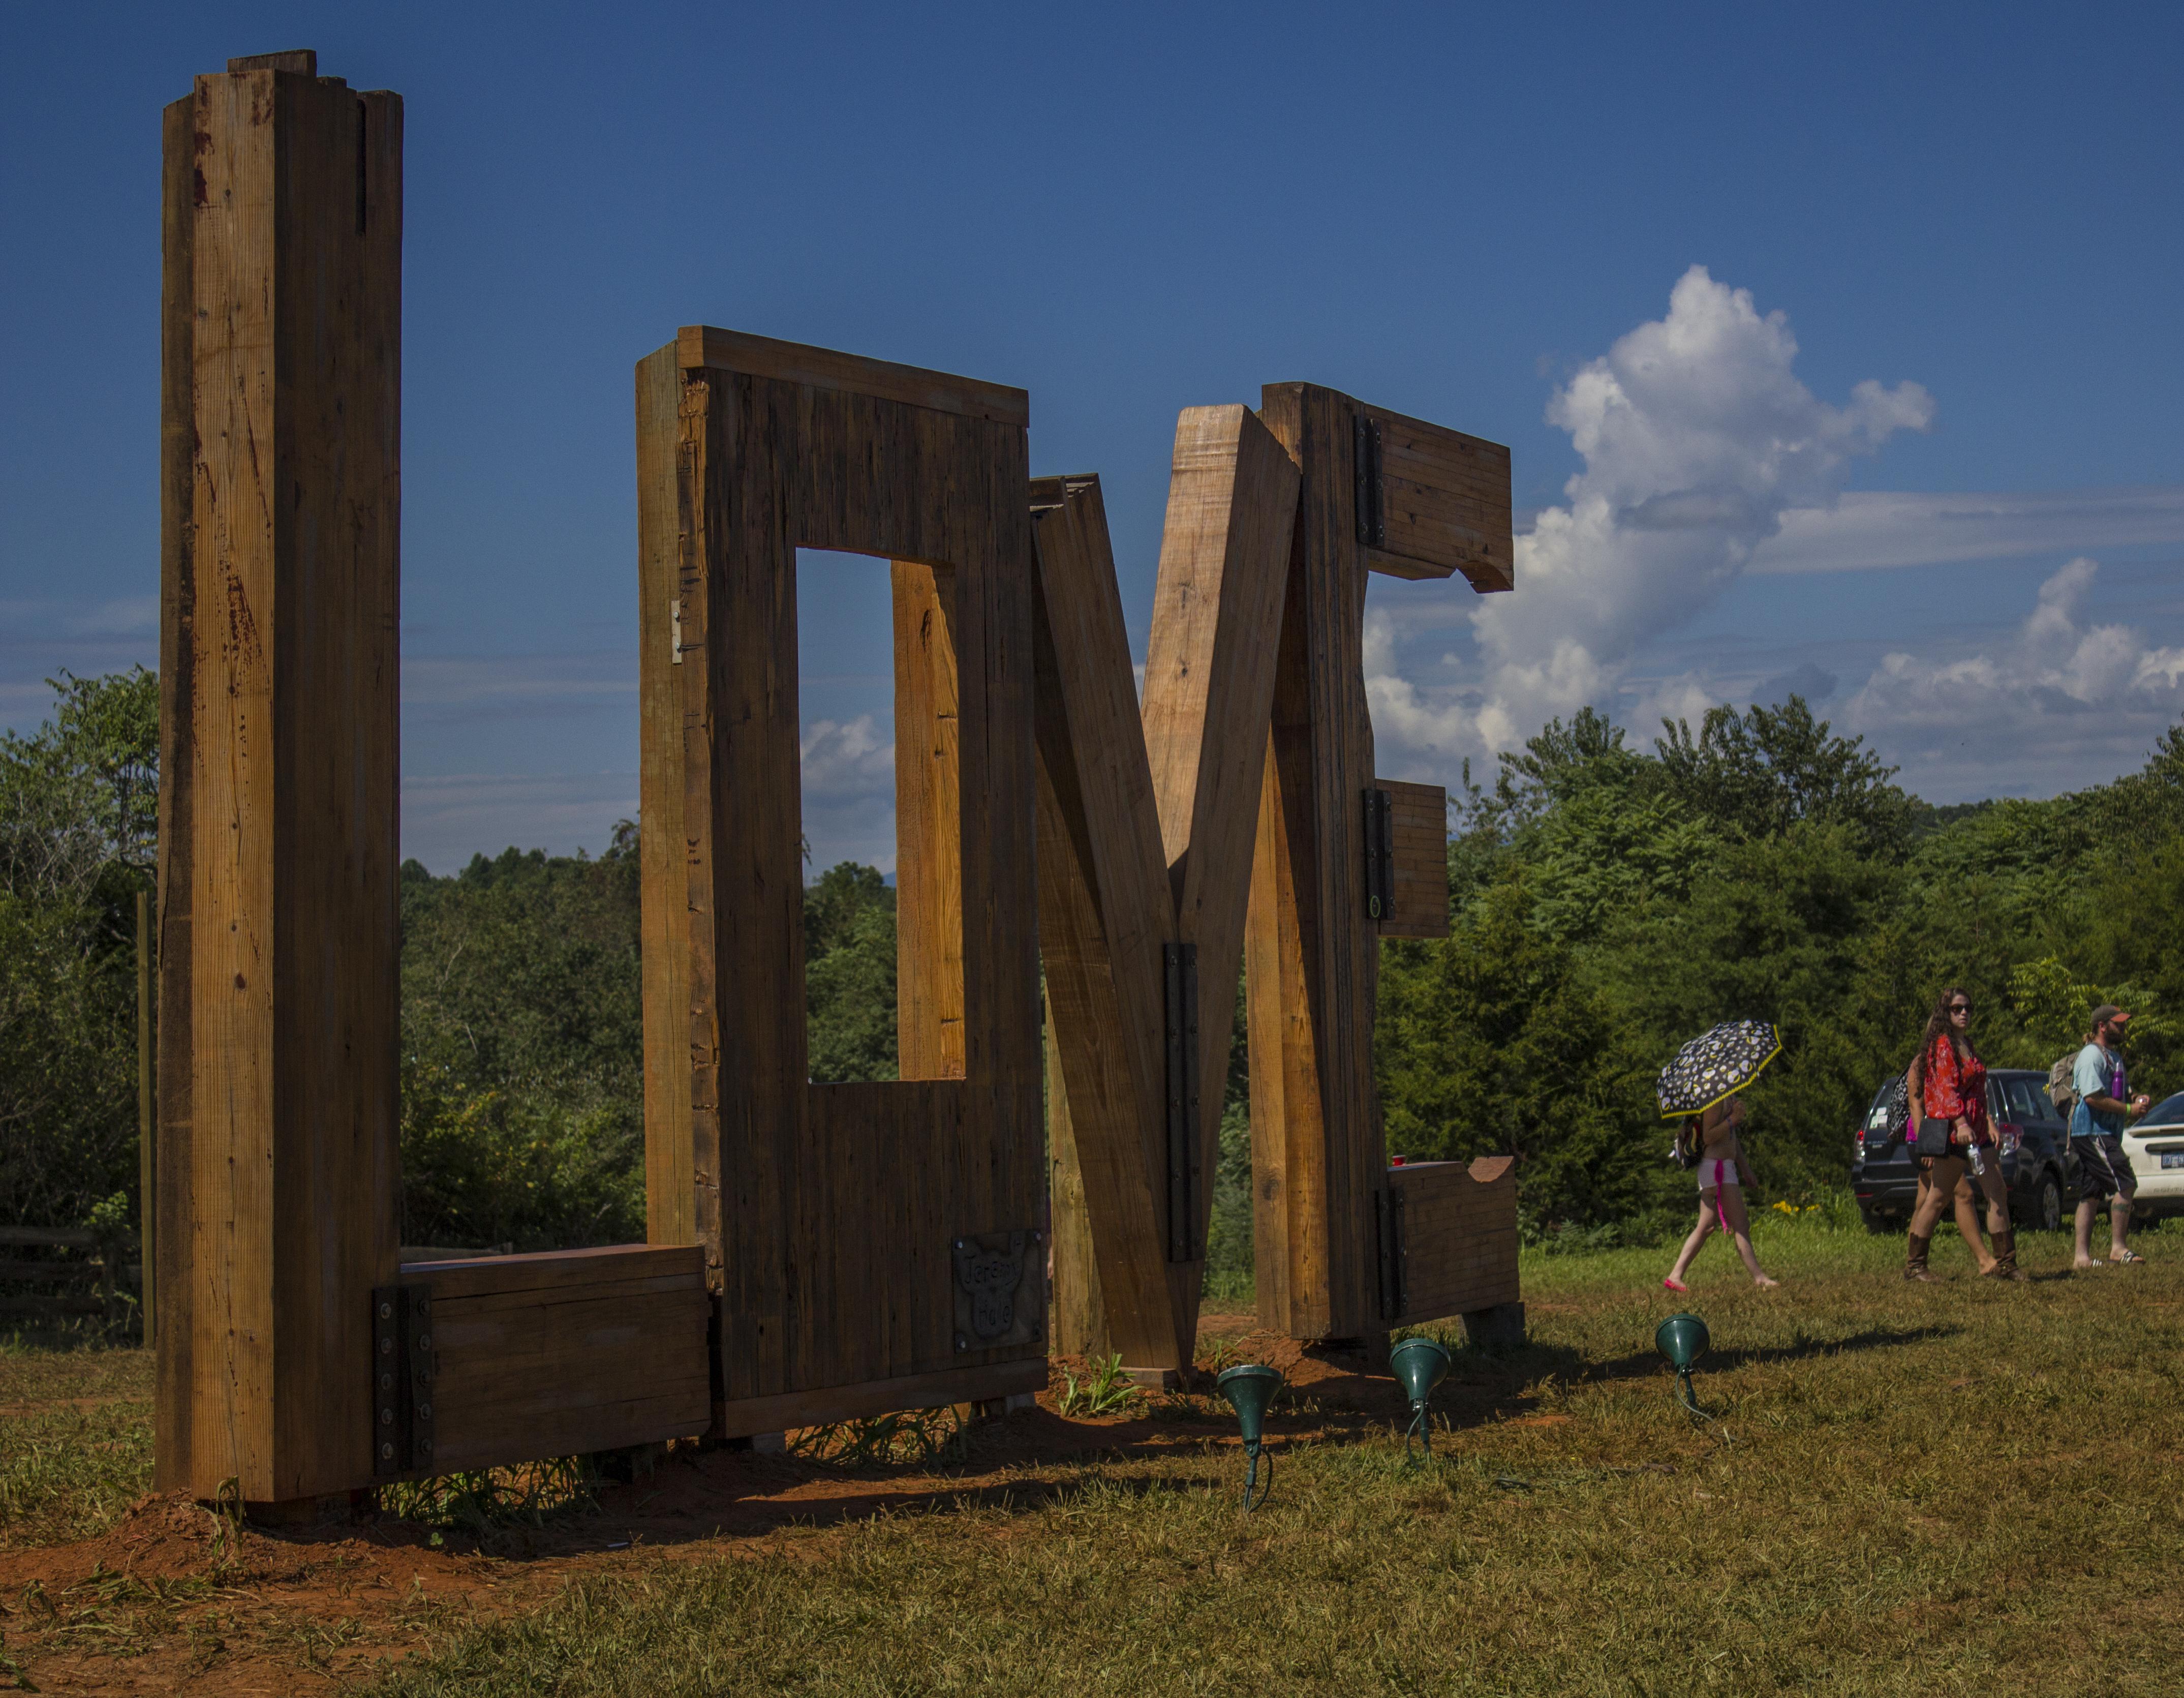 Lockn Music Festival 2014. Photo by: Matthew McGuire